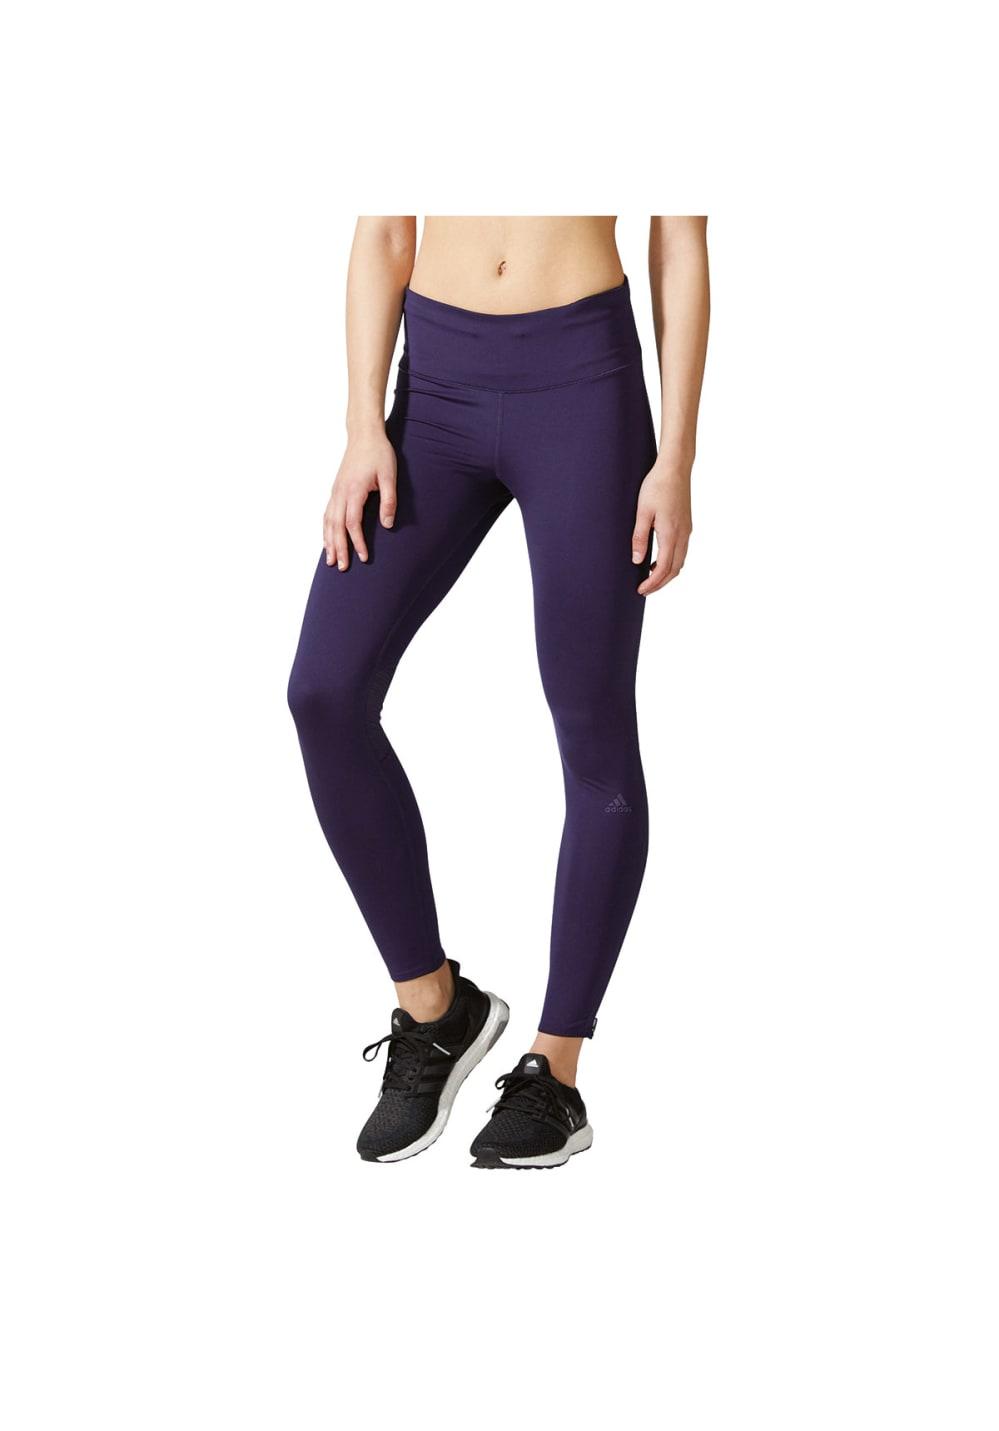 b749f3a9bafb adidas Supernova Long Tights - Running trousers for Women - Purple ...